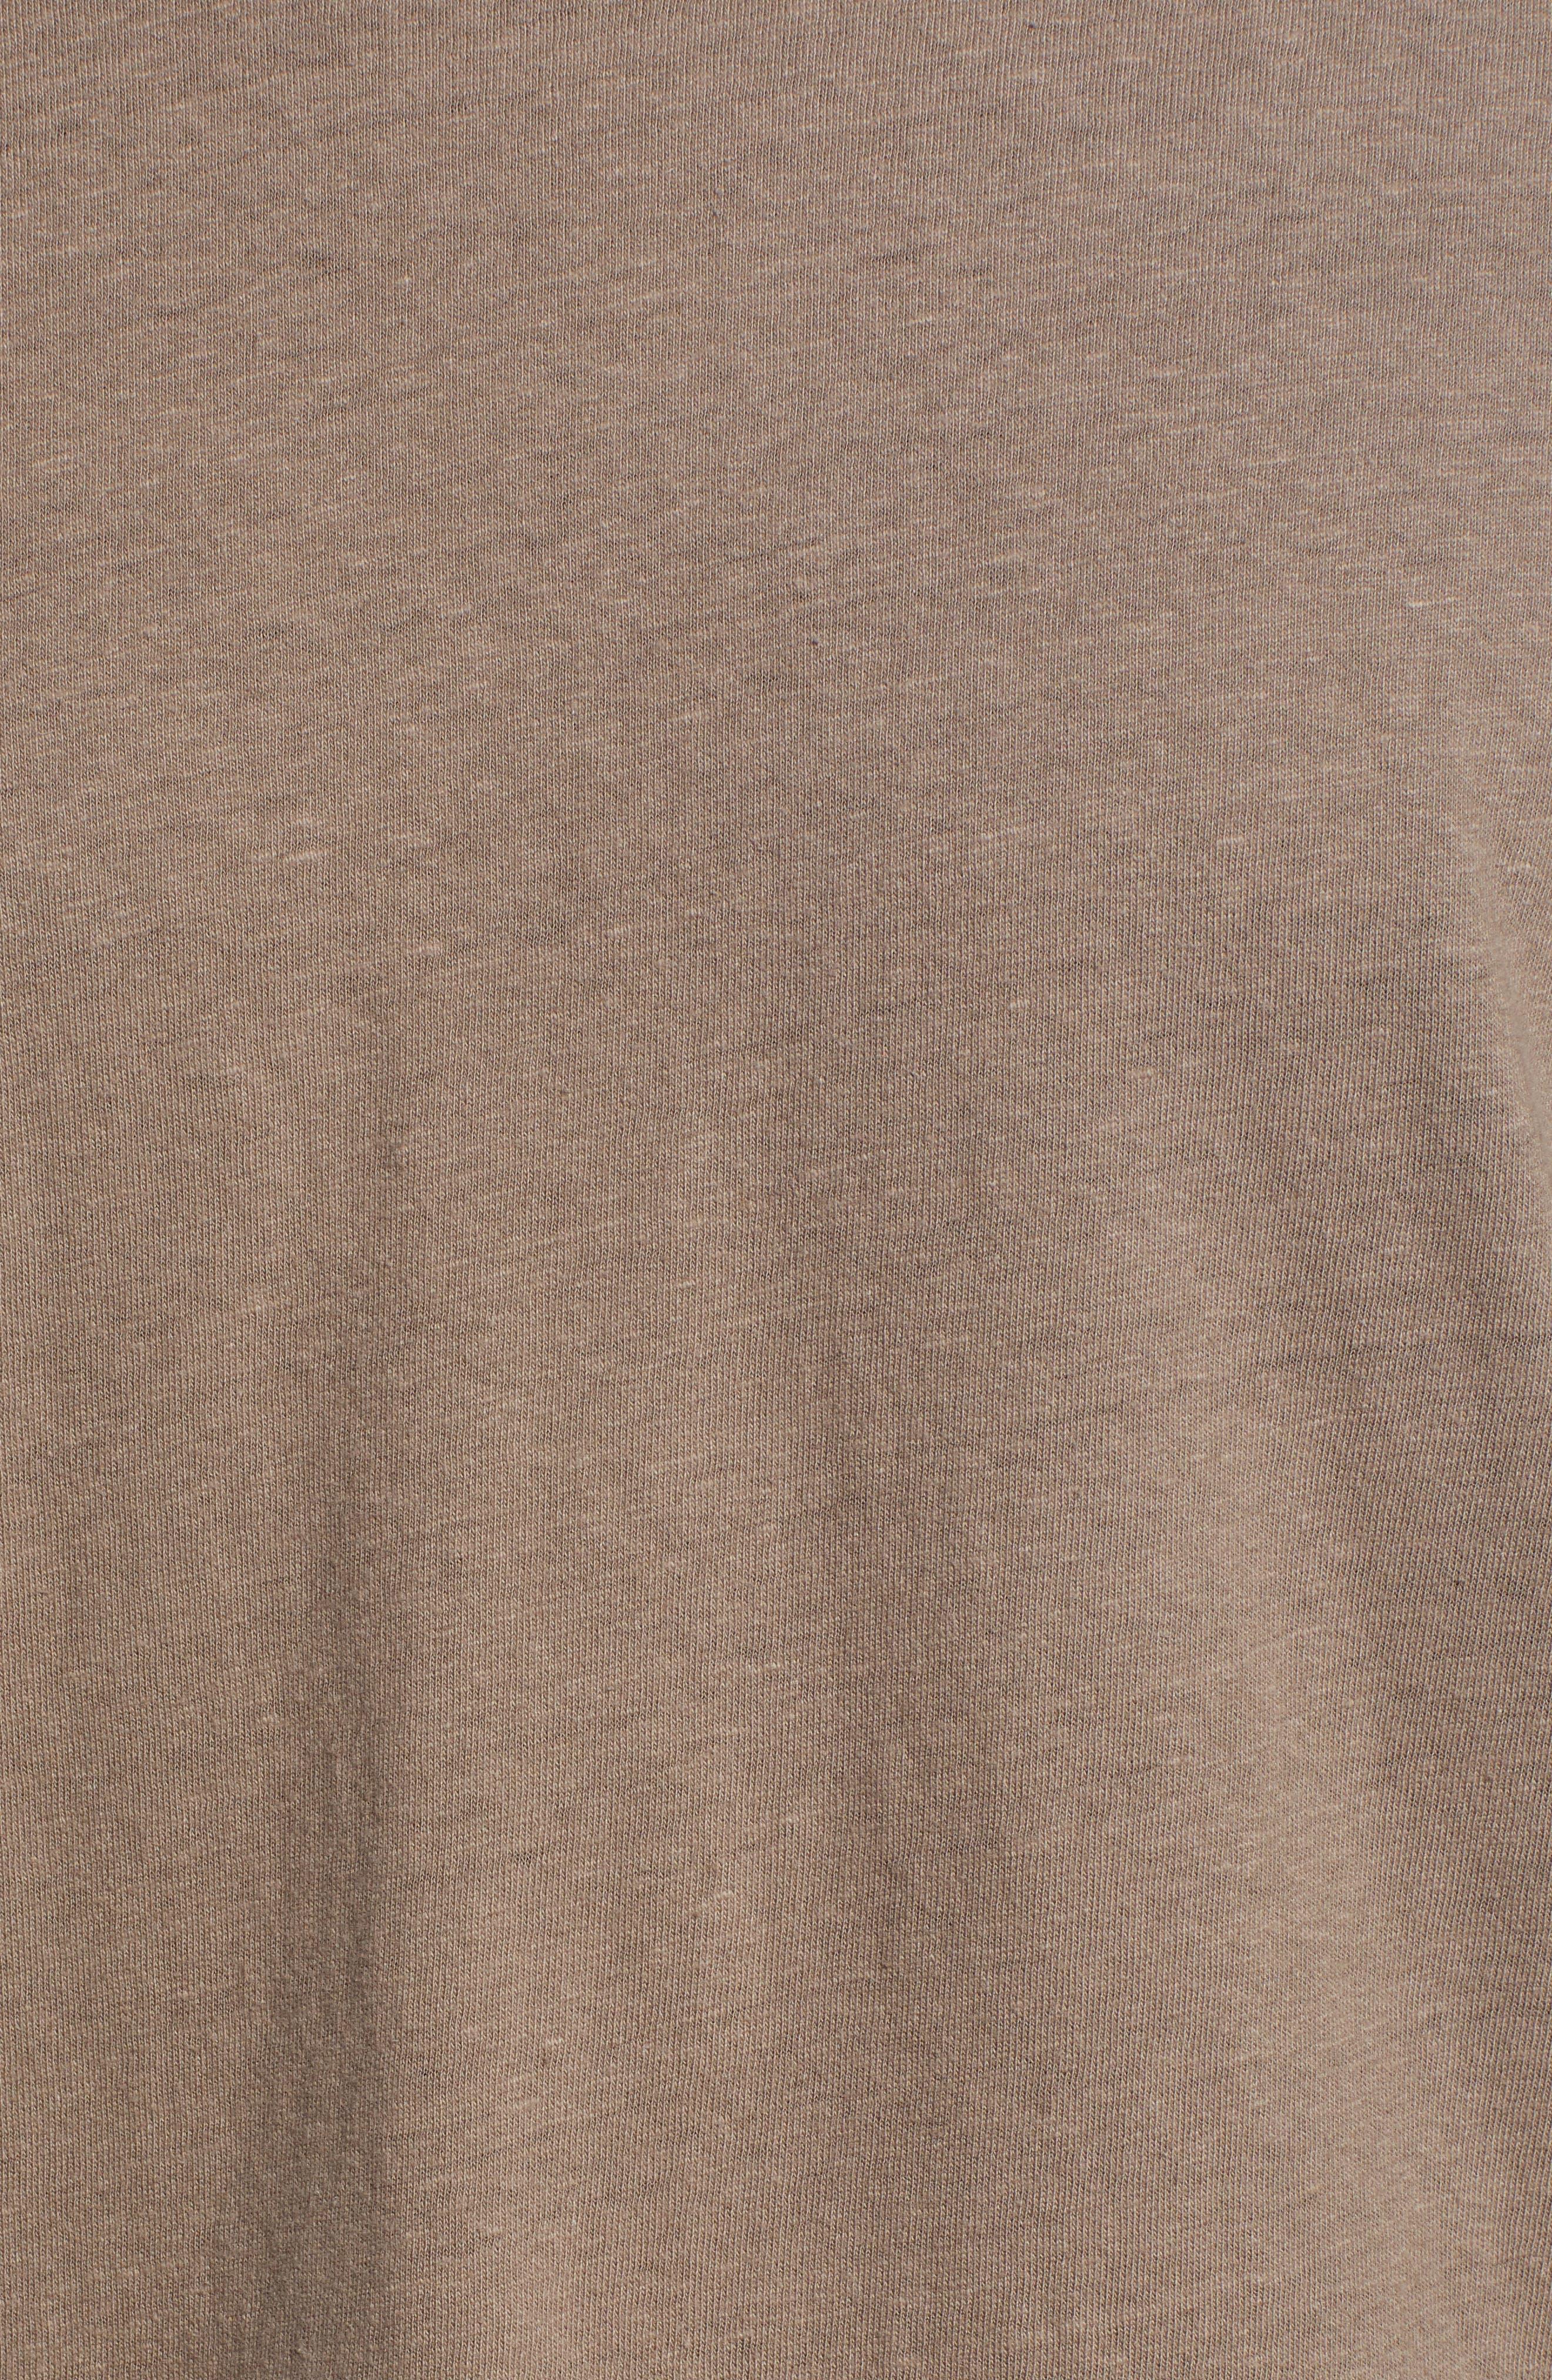 Ramsey Slim Fit Crewneck T-Shirt,                             Alternate thumbnail 5, color,                             WEATHERED WET